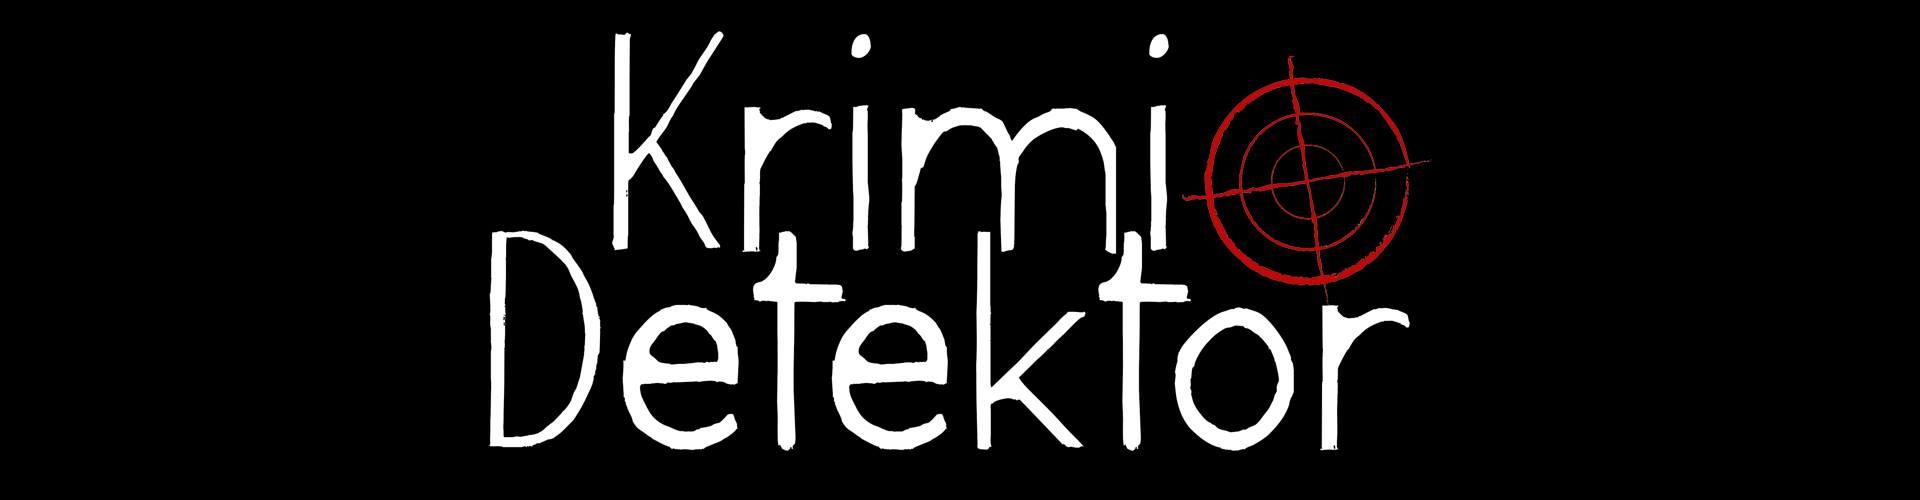 KrimiDetektor